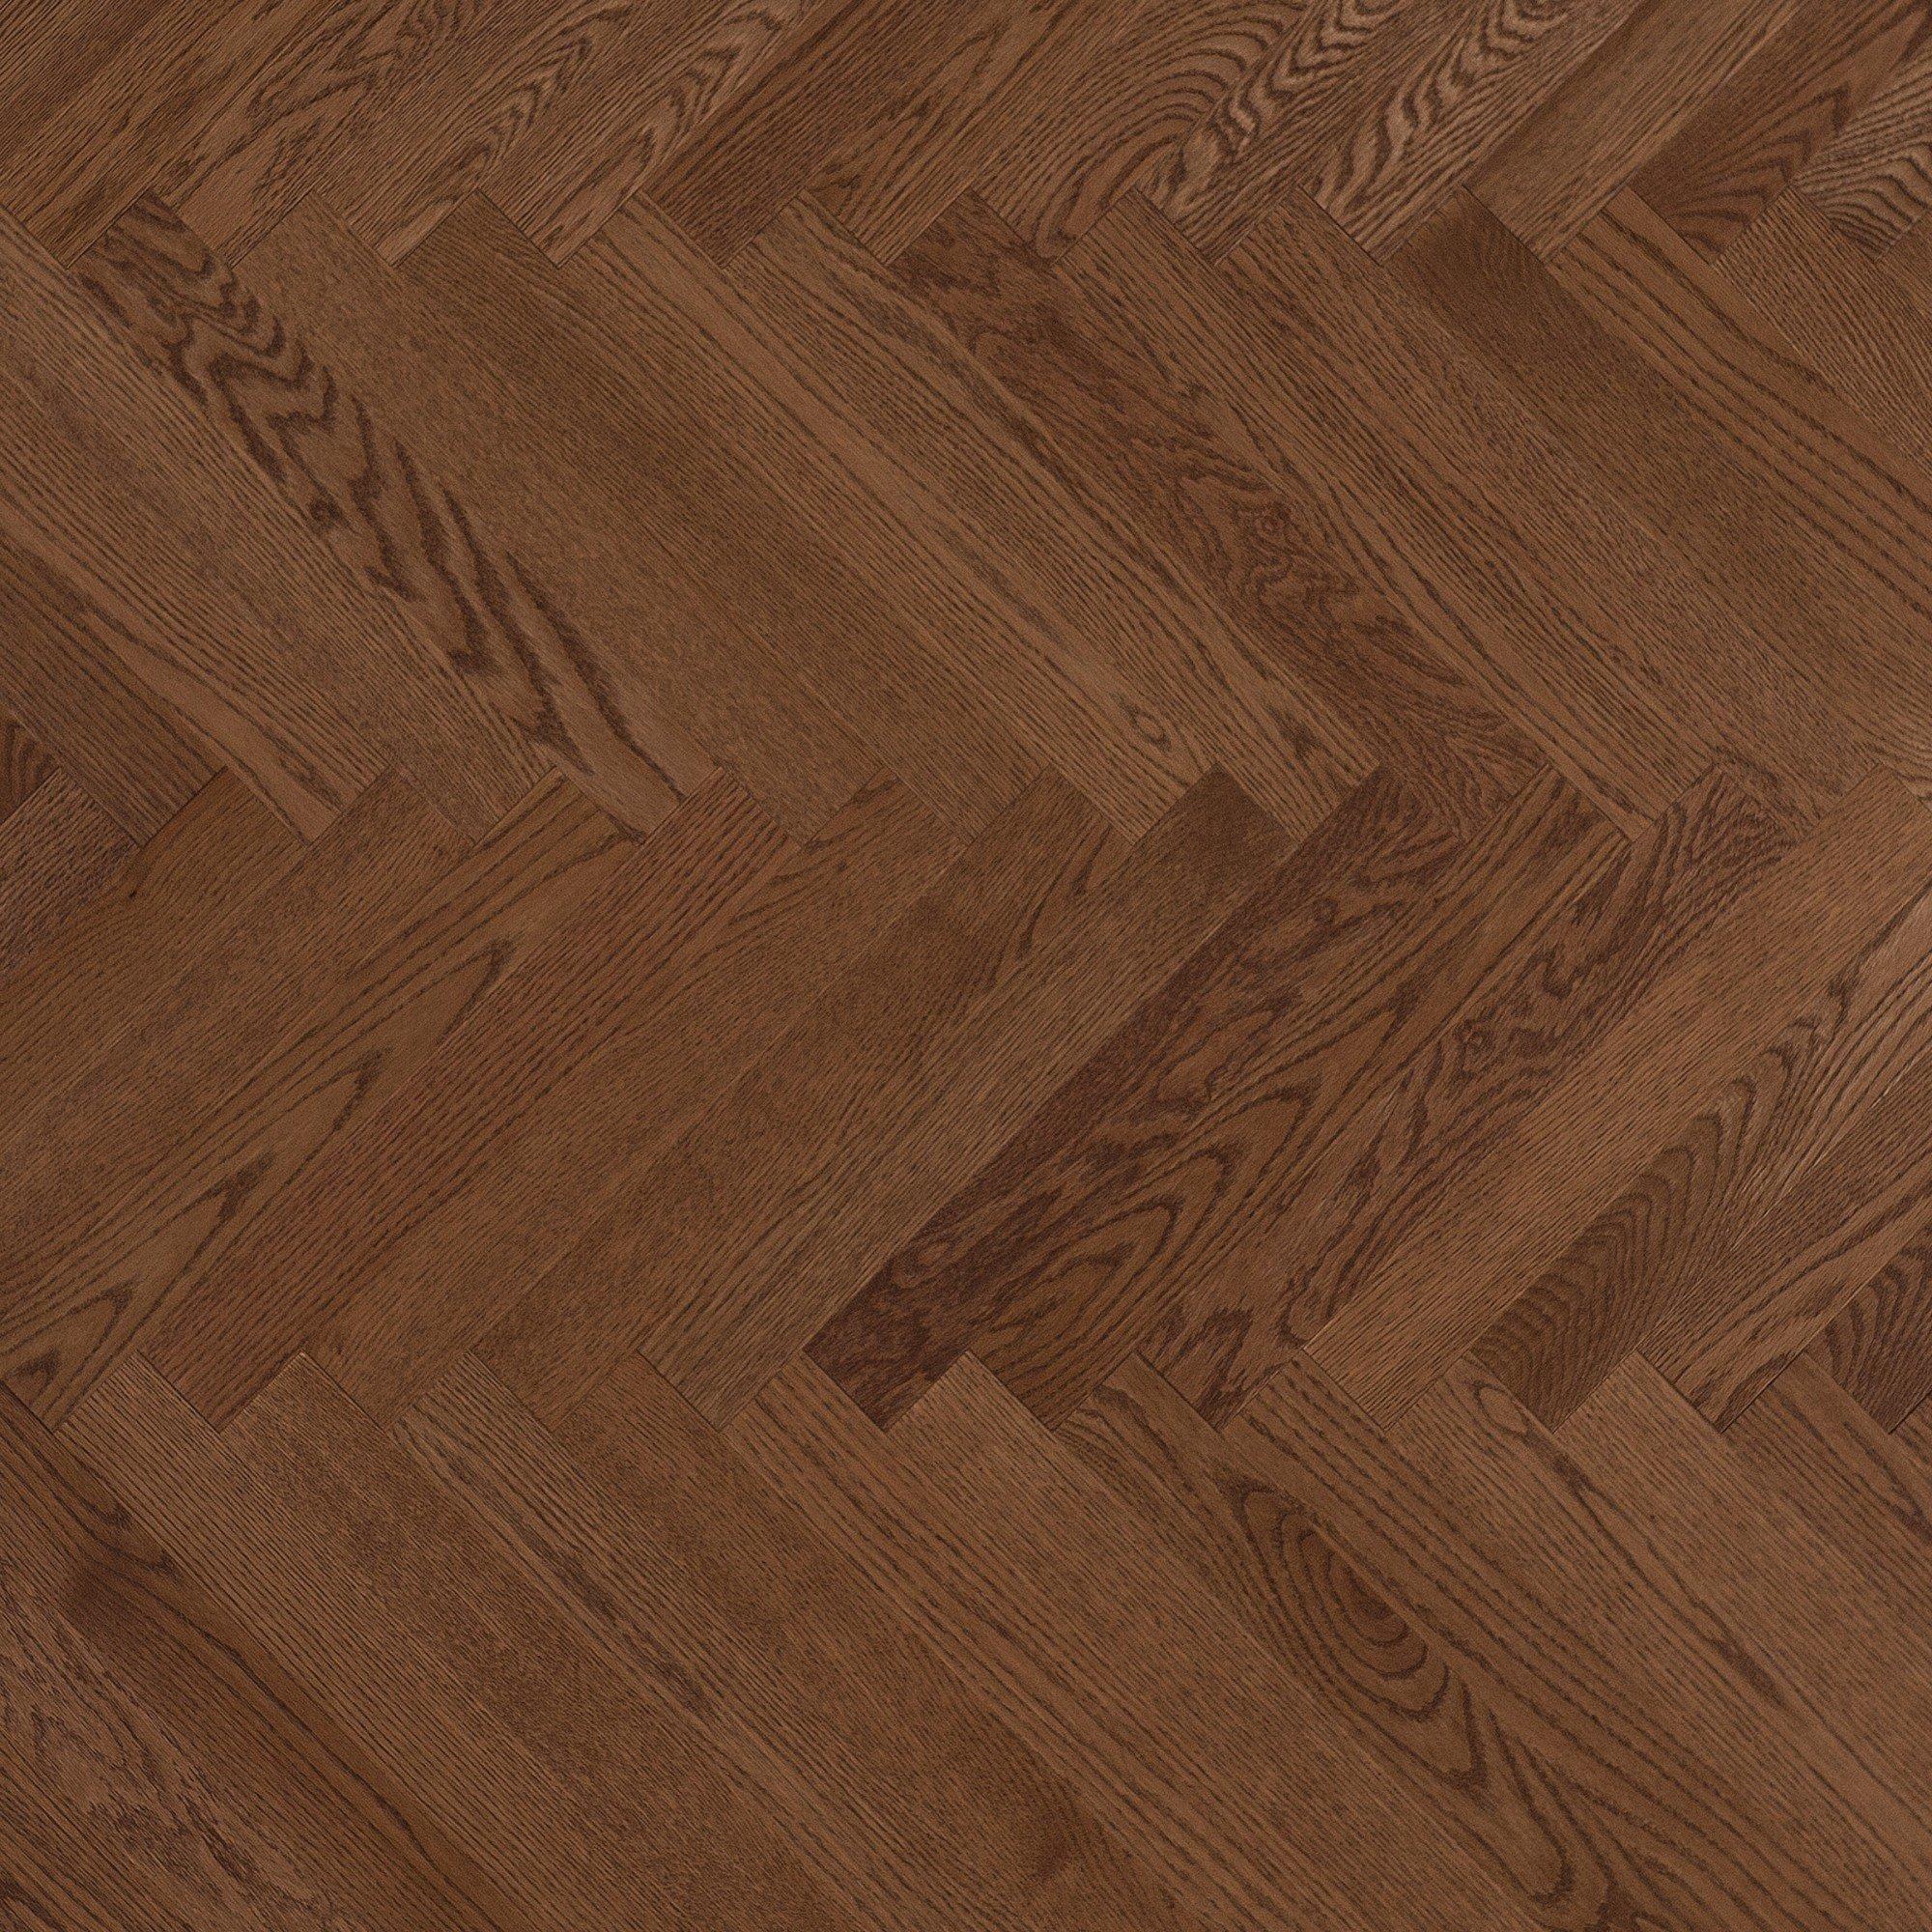 Red Oak Savanna Exclusive Smooth - Floor image